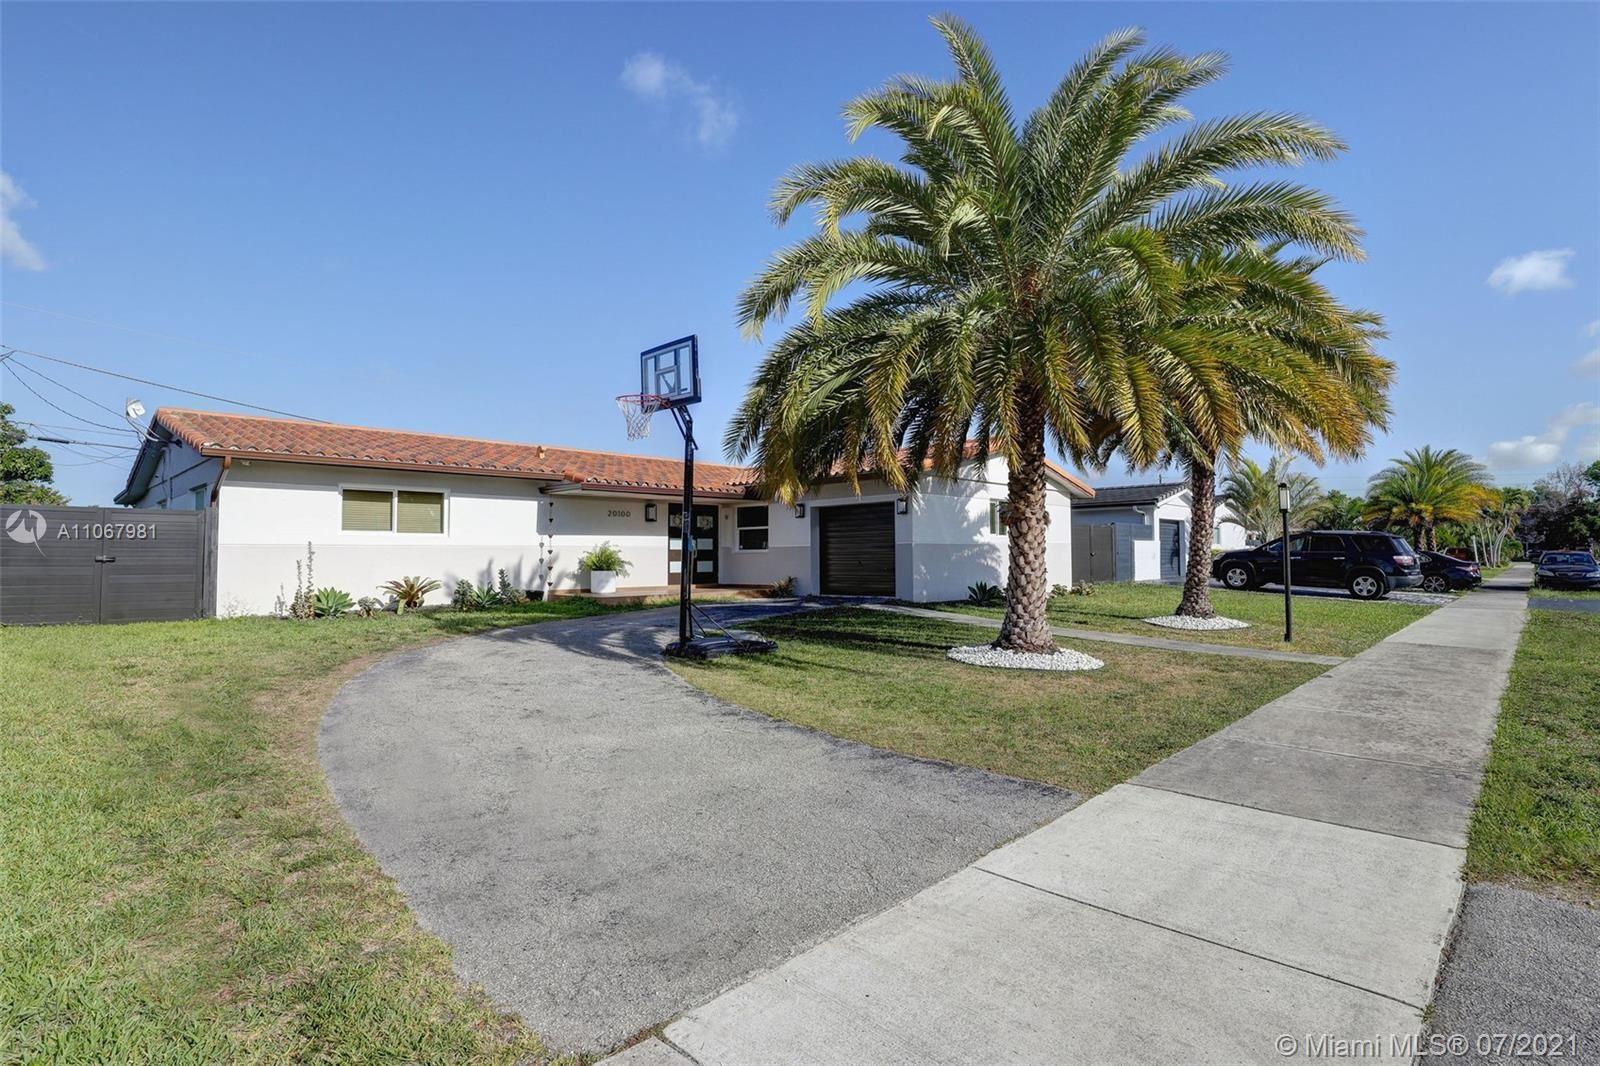 20100 SW 112th Ave, Cutler Bay, FL 33189 - #: A11067981